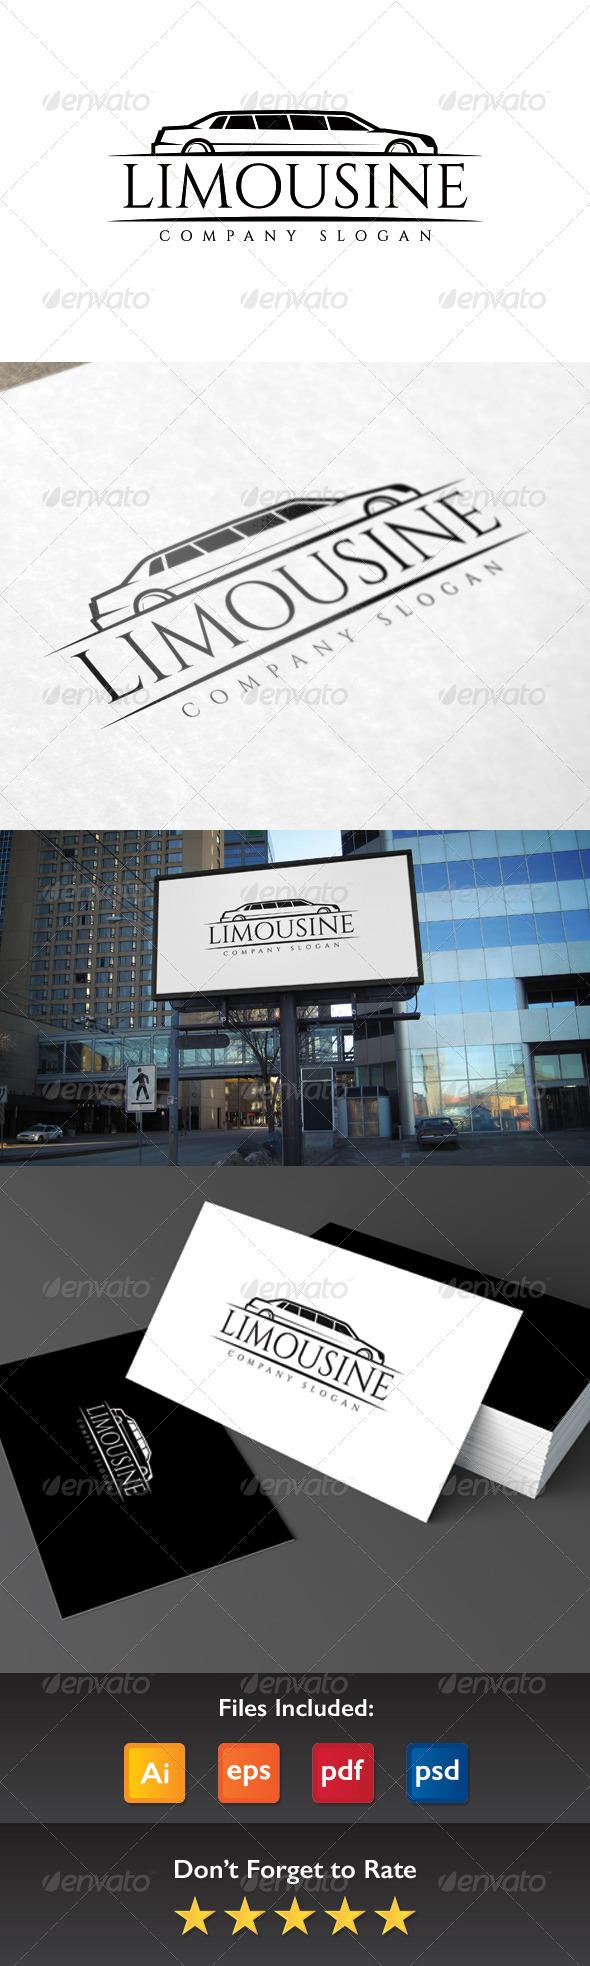 GraphicRiver Limousine Logo 8528104